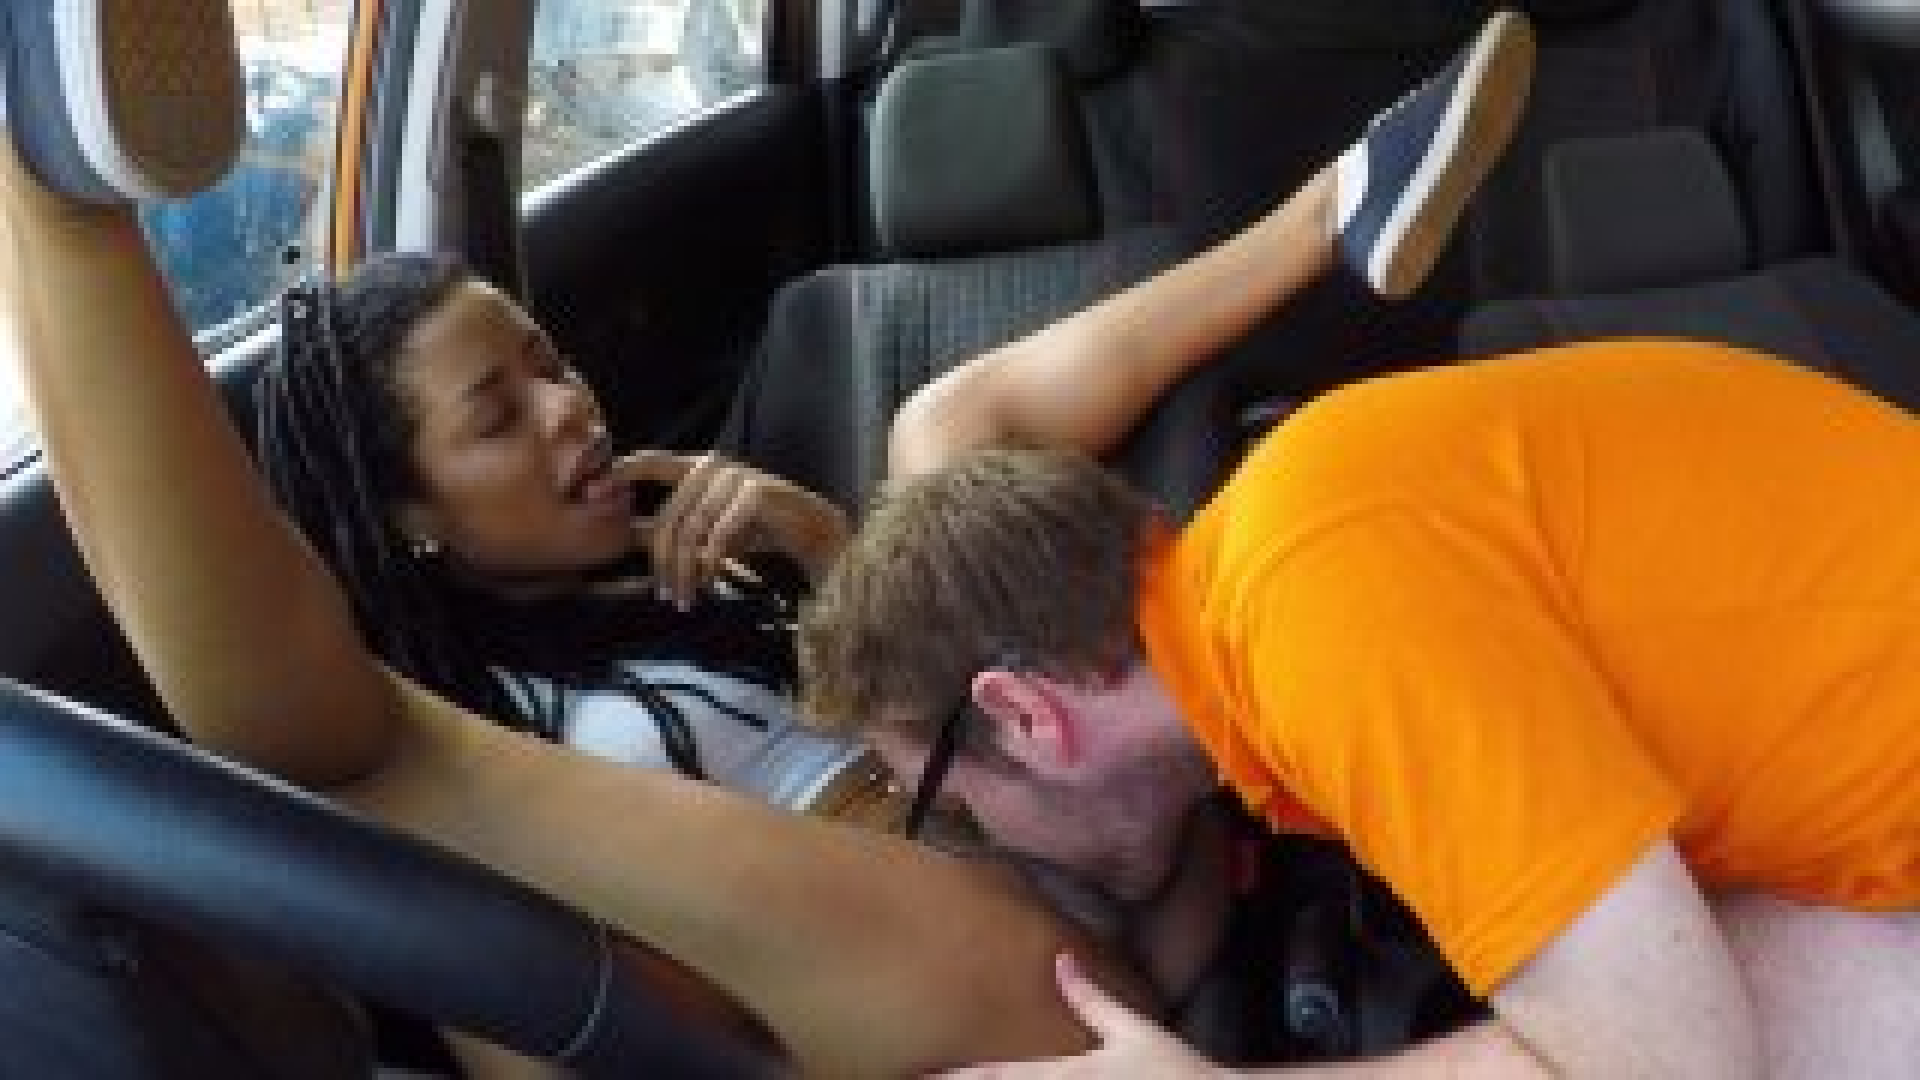 Ebony American minx craves creampie - Fake Driving School